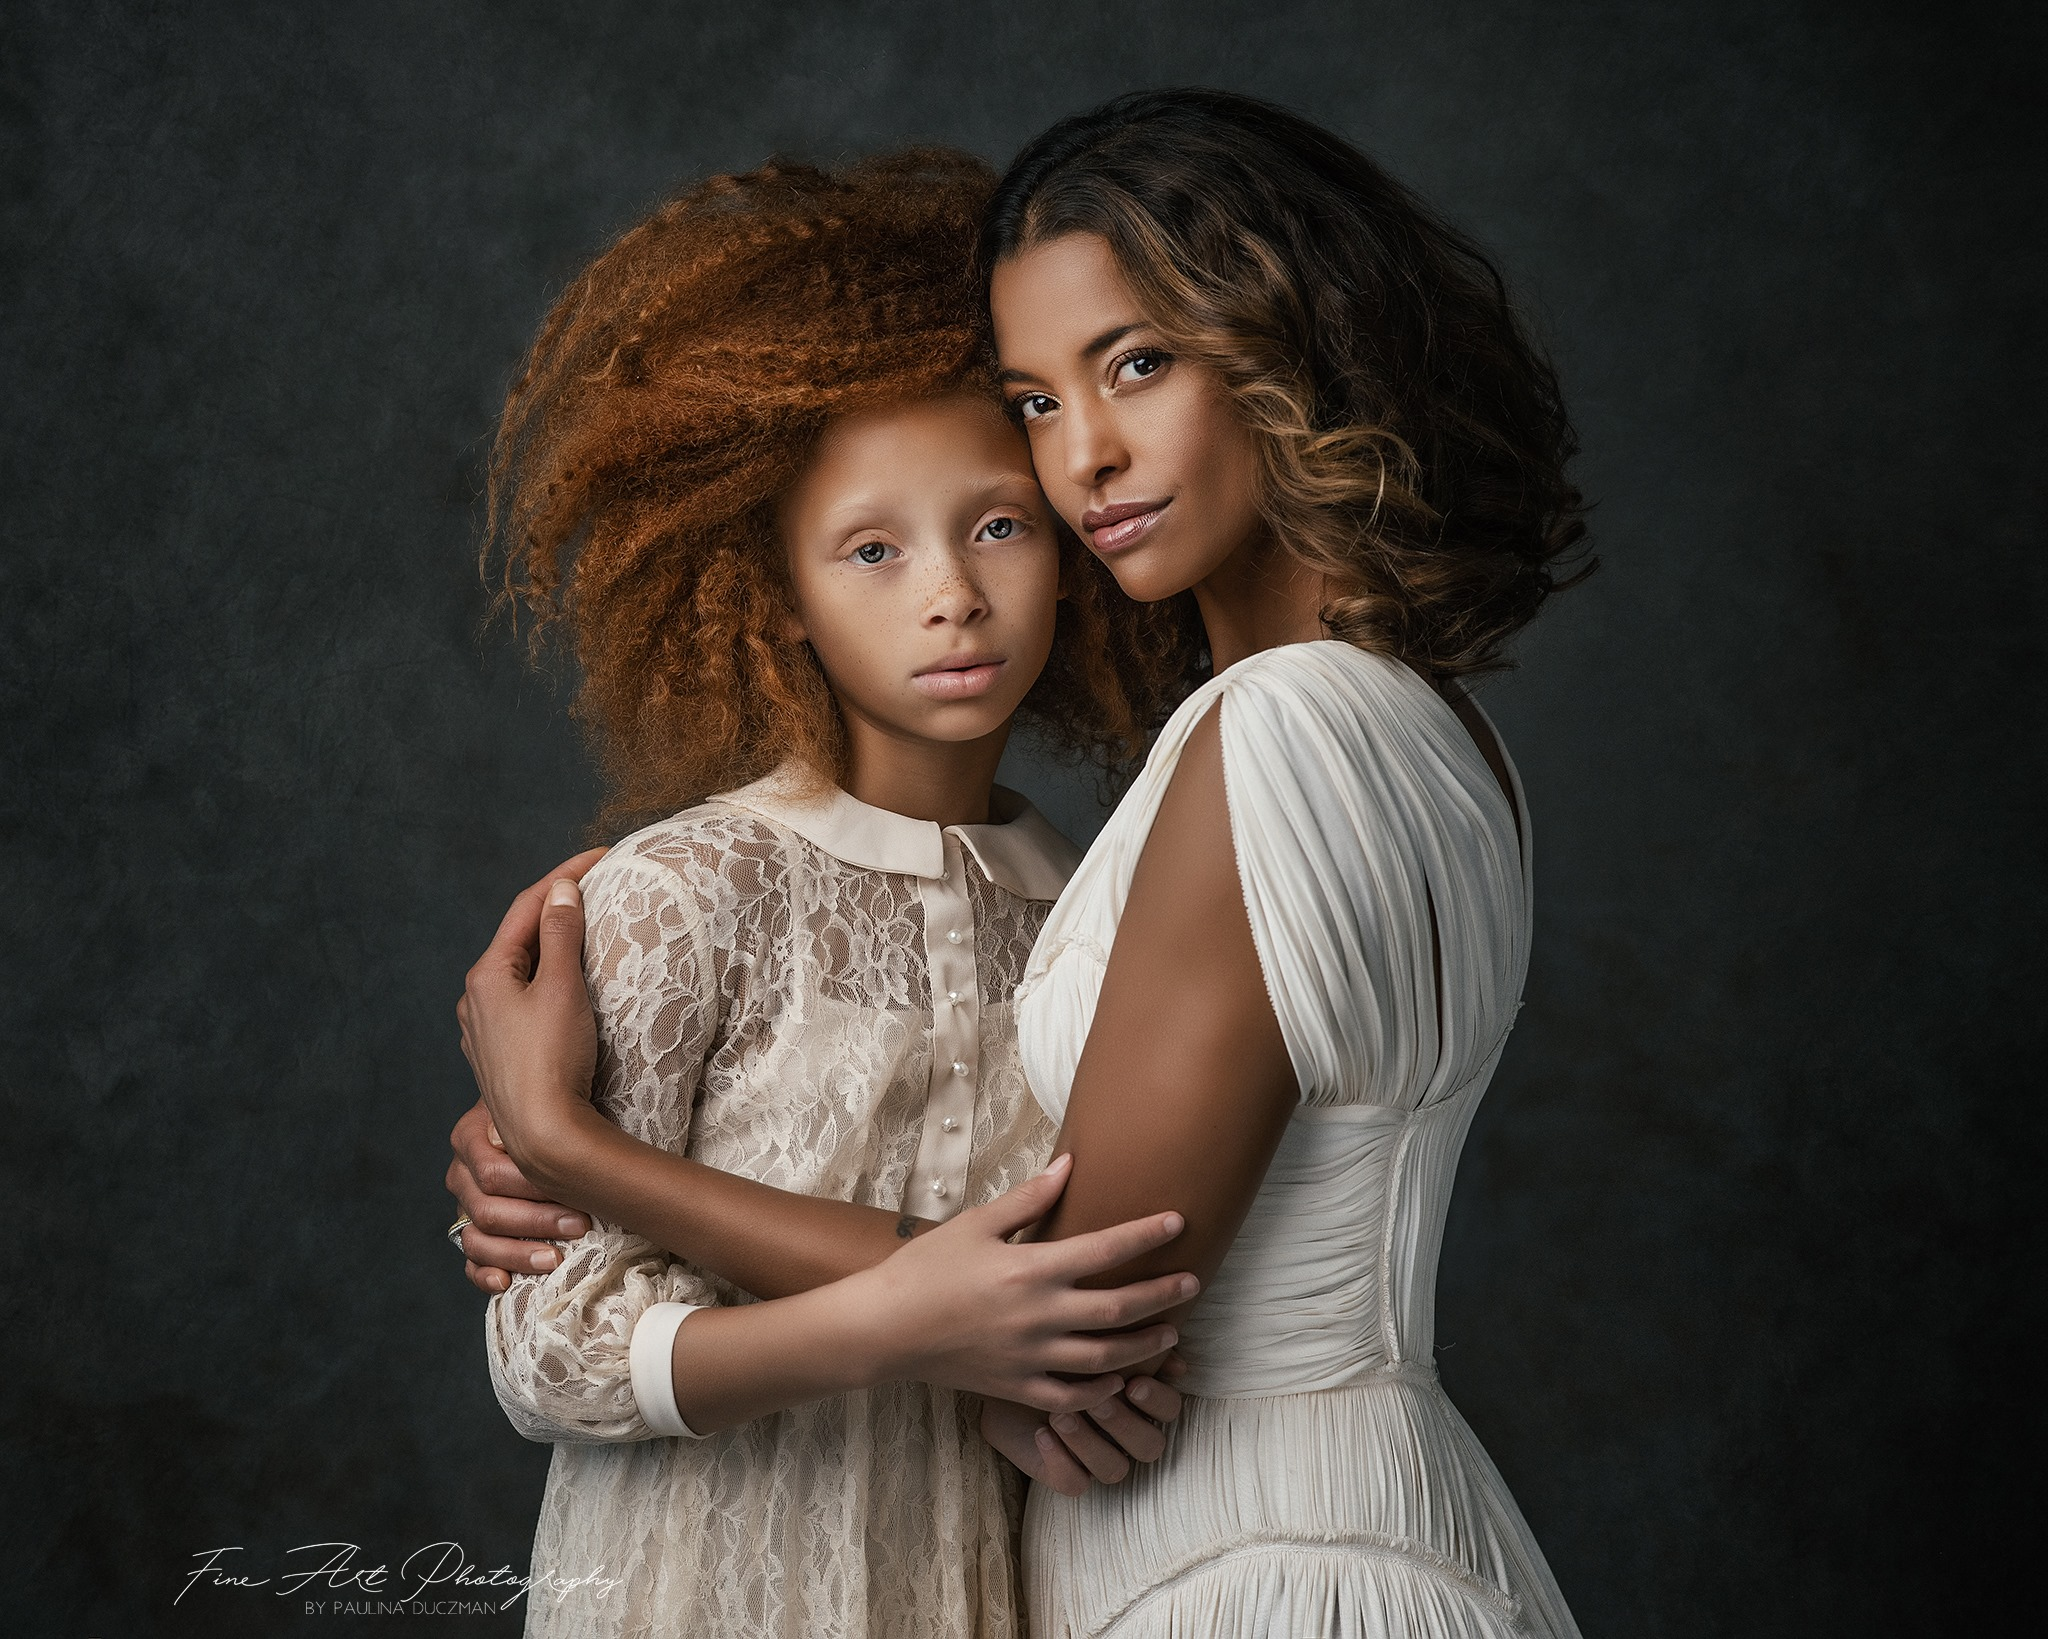 Incredible Vintage Portrait photography by Paulina Duczman.